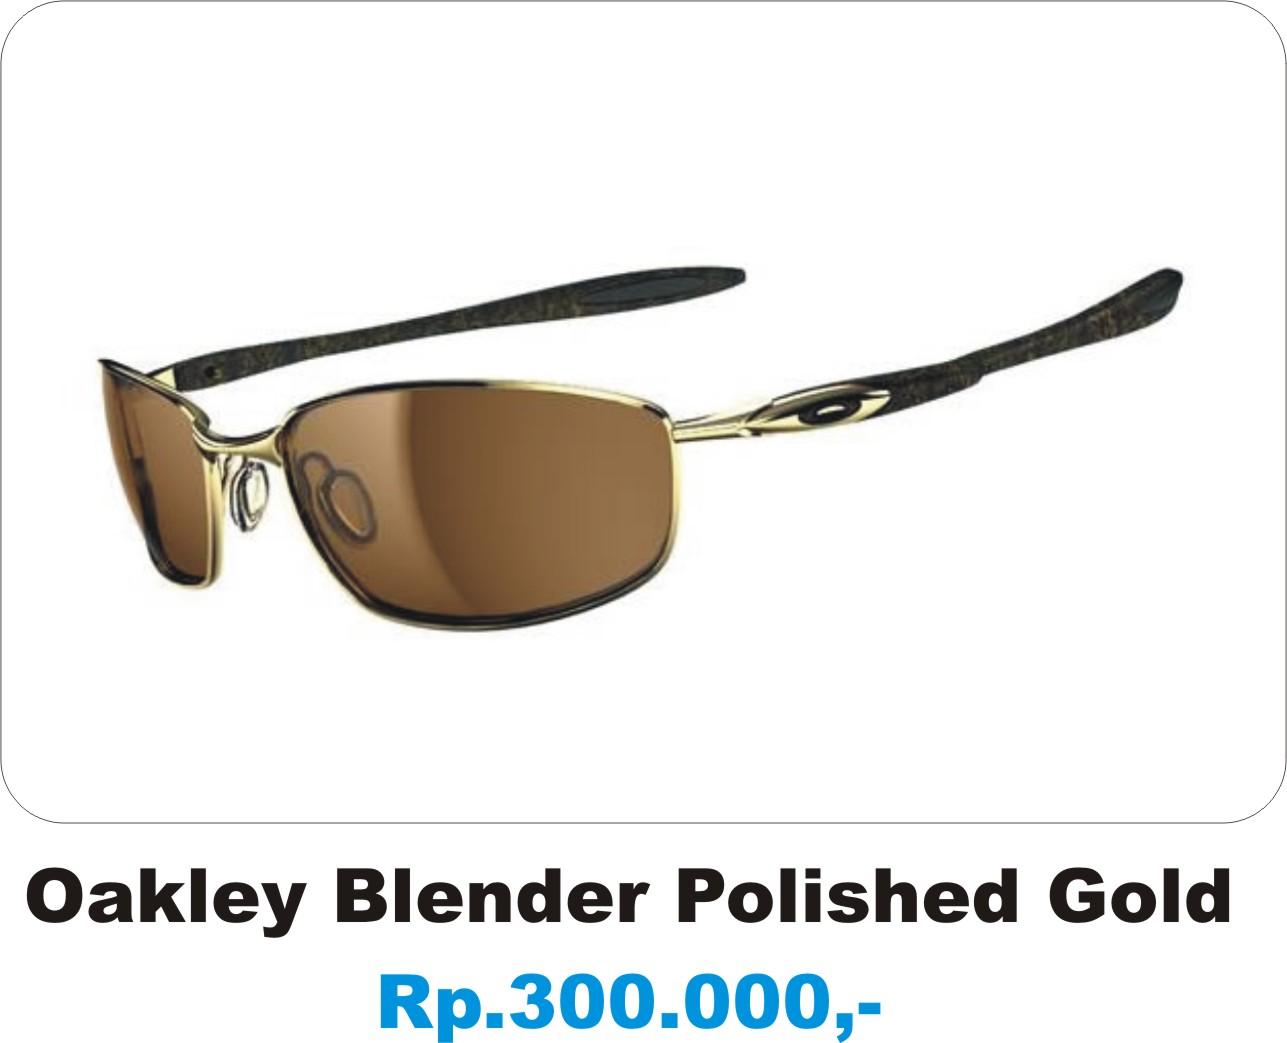 Oakley Fuel Cell Polarized >> Toko jual Kacamata oakley murah online | grosir kacamata online | sunglass oakley | kacamata ...